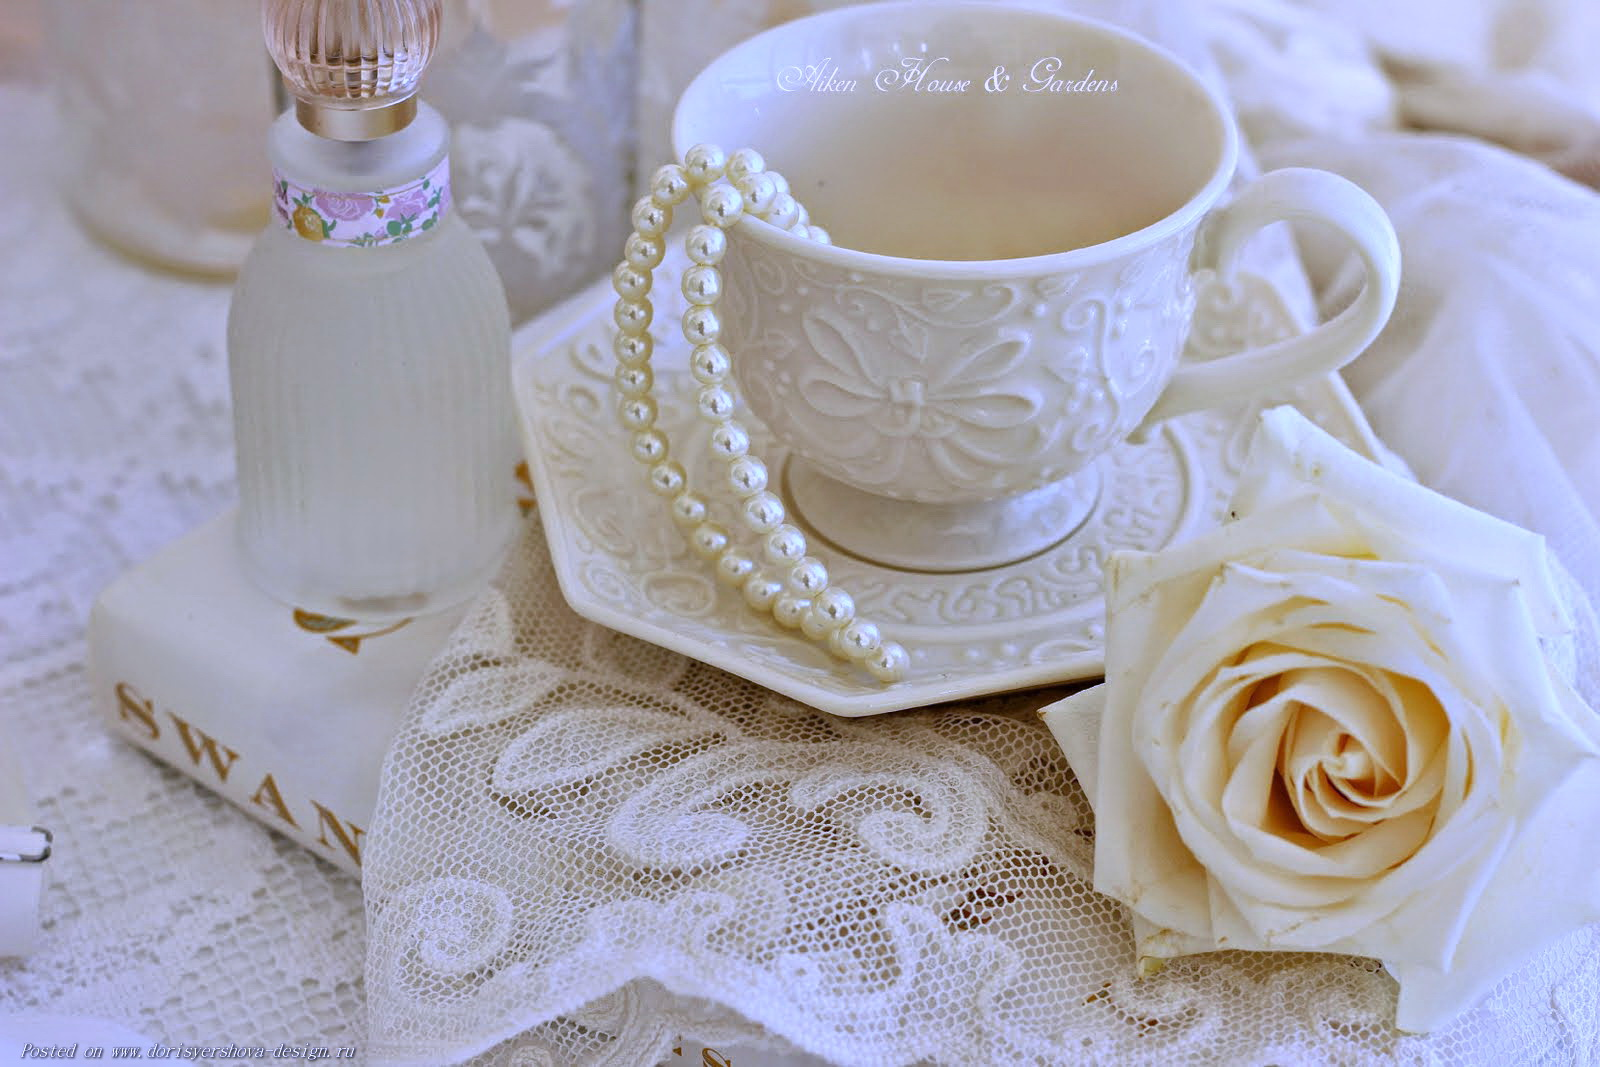 керолин айкен, белое платье, жемчуг, белые розы, белые кружева, романтика белого цвета, кантри-стиль, кантри, винтажный кантри-стиль, белый, изысканный, Carolyne Aiken, white dress, pearls, white roses, white lace, white romance, country style, country, vintage country-style, white, elegant,